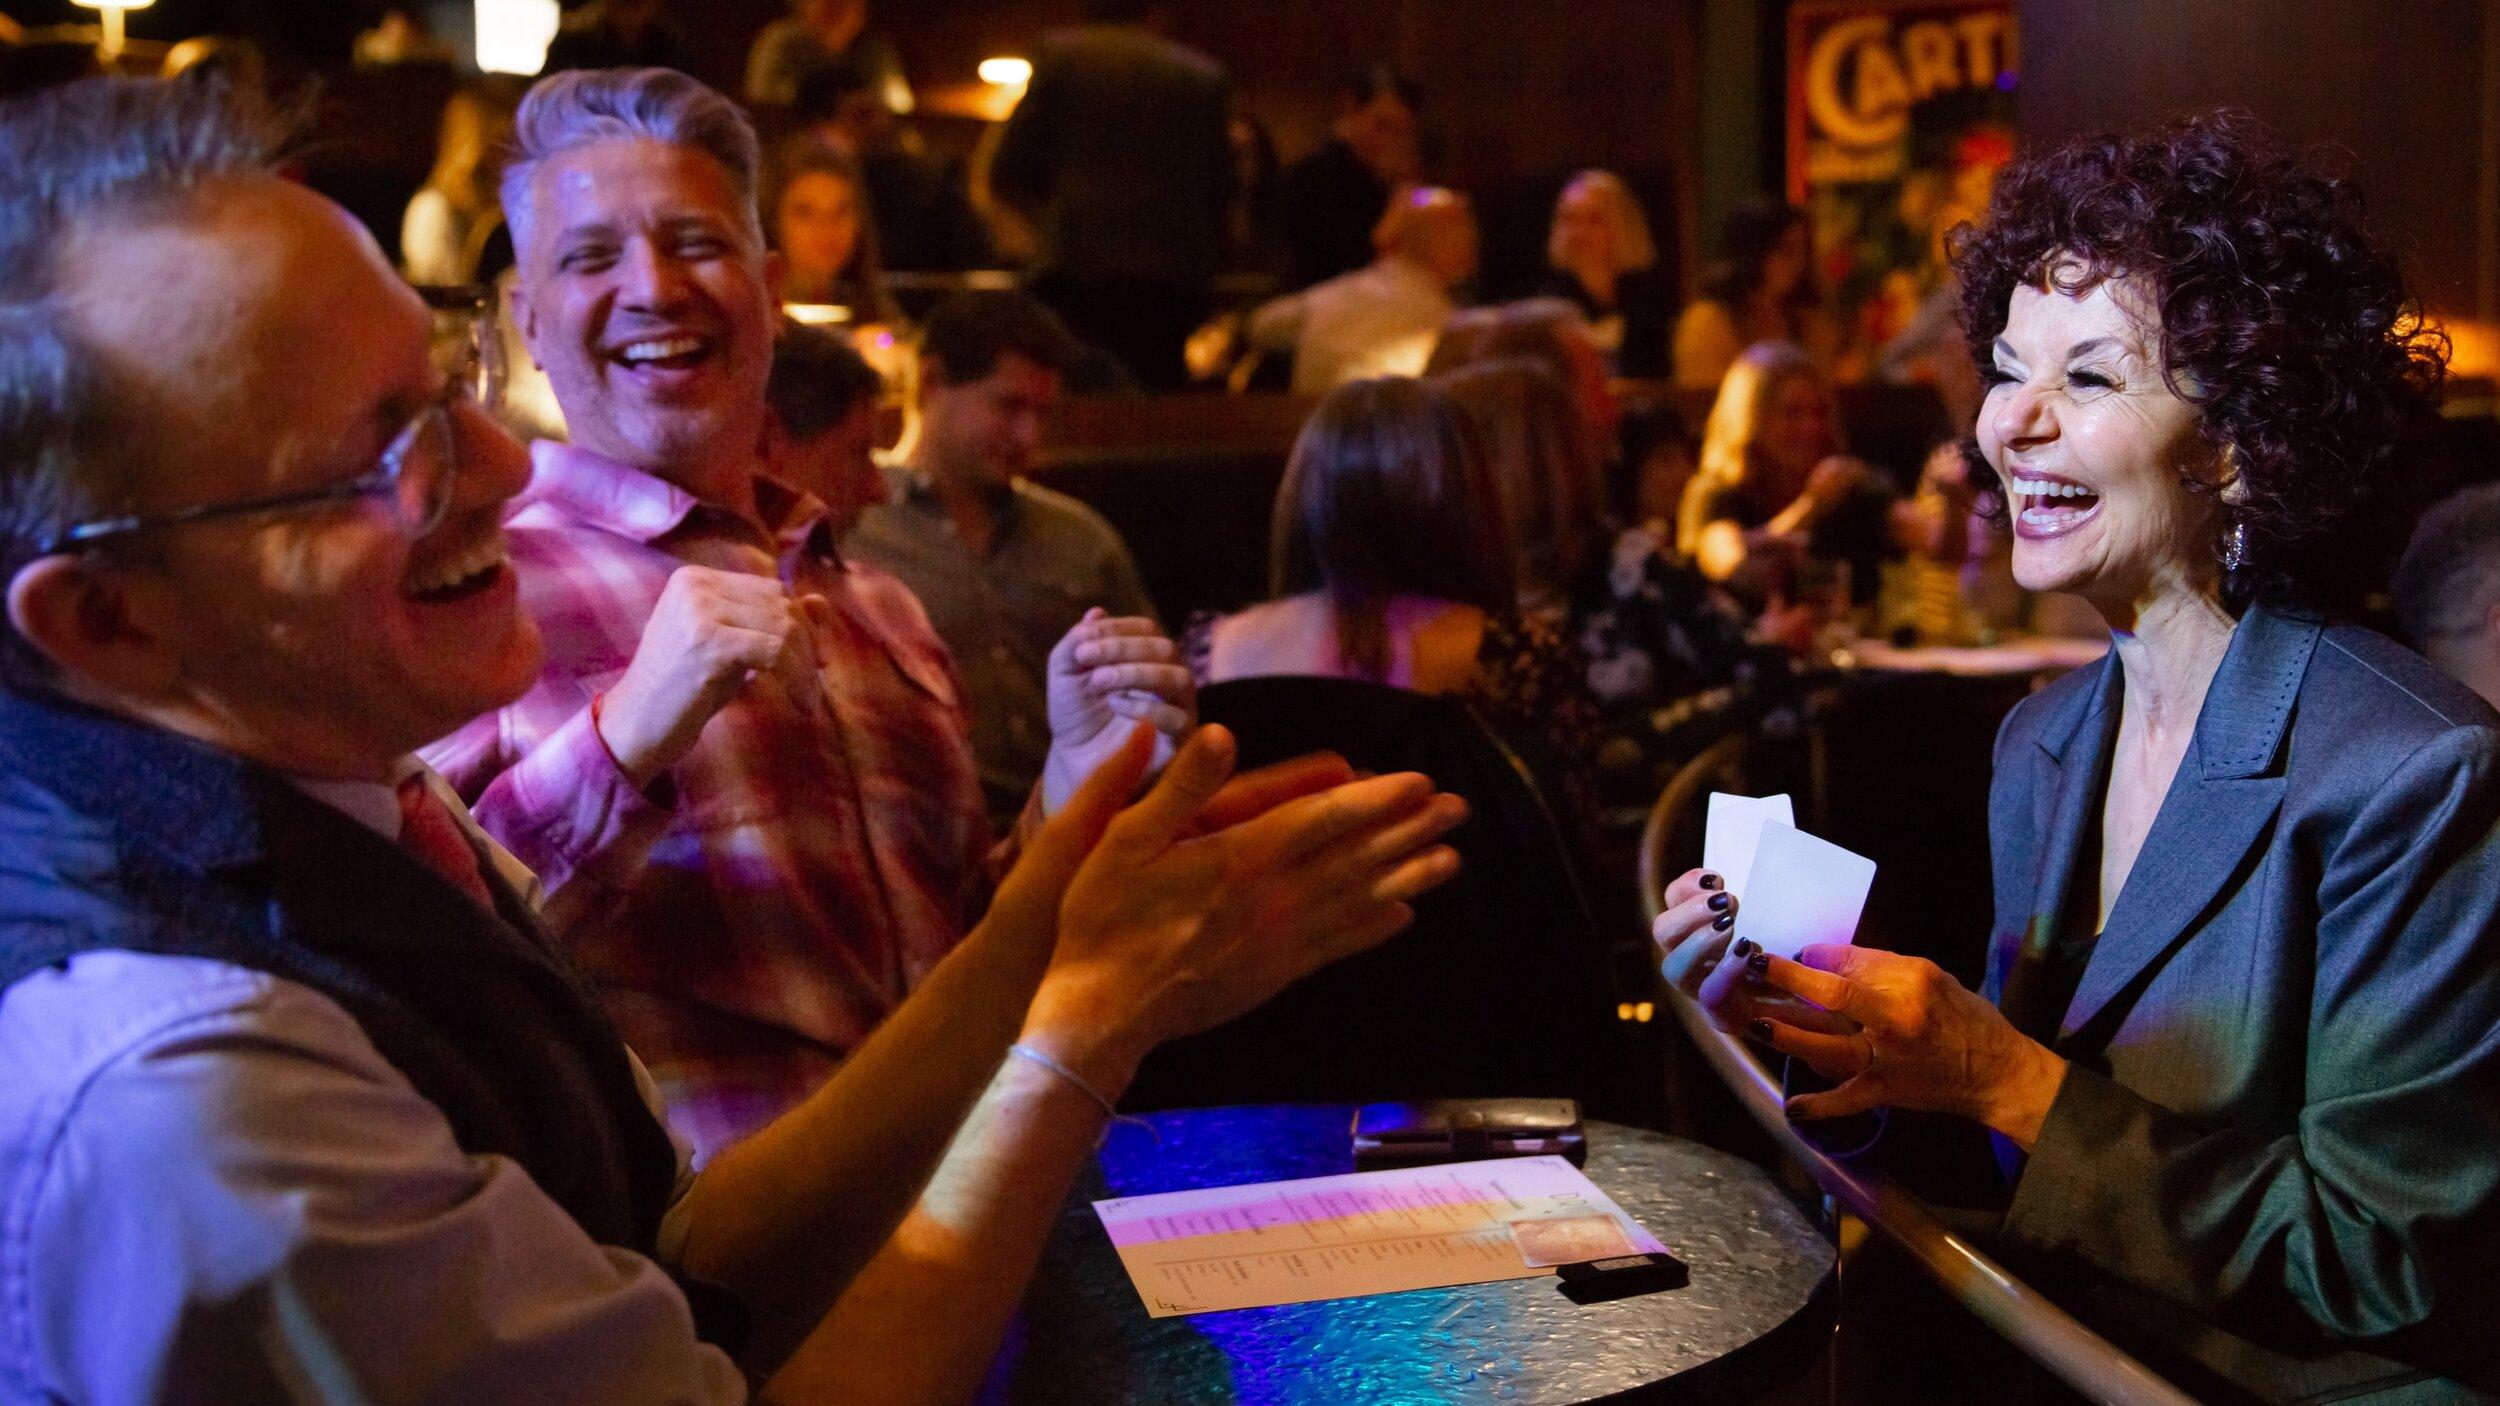 Jan Rose performing table magic at Chicago Magic Lounge.jpg